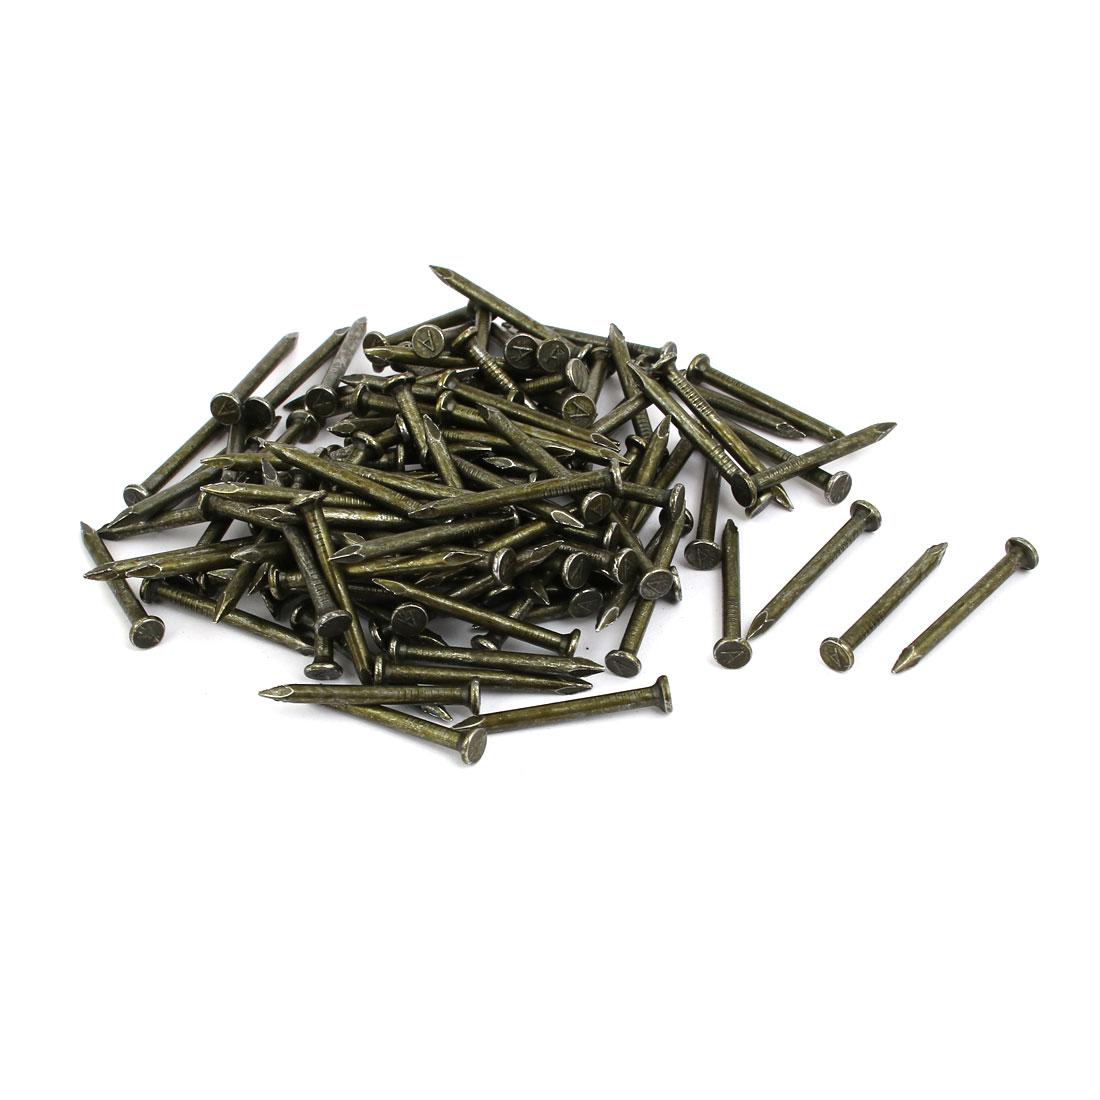 Fiber Concrete Cement Wall Carbon Steel Point Tip Wire Nails 2.8mmx32mm 200PCS